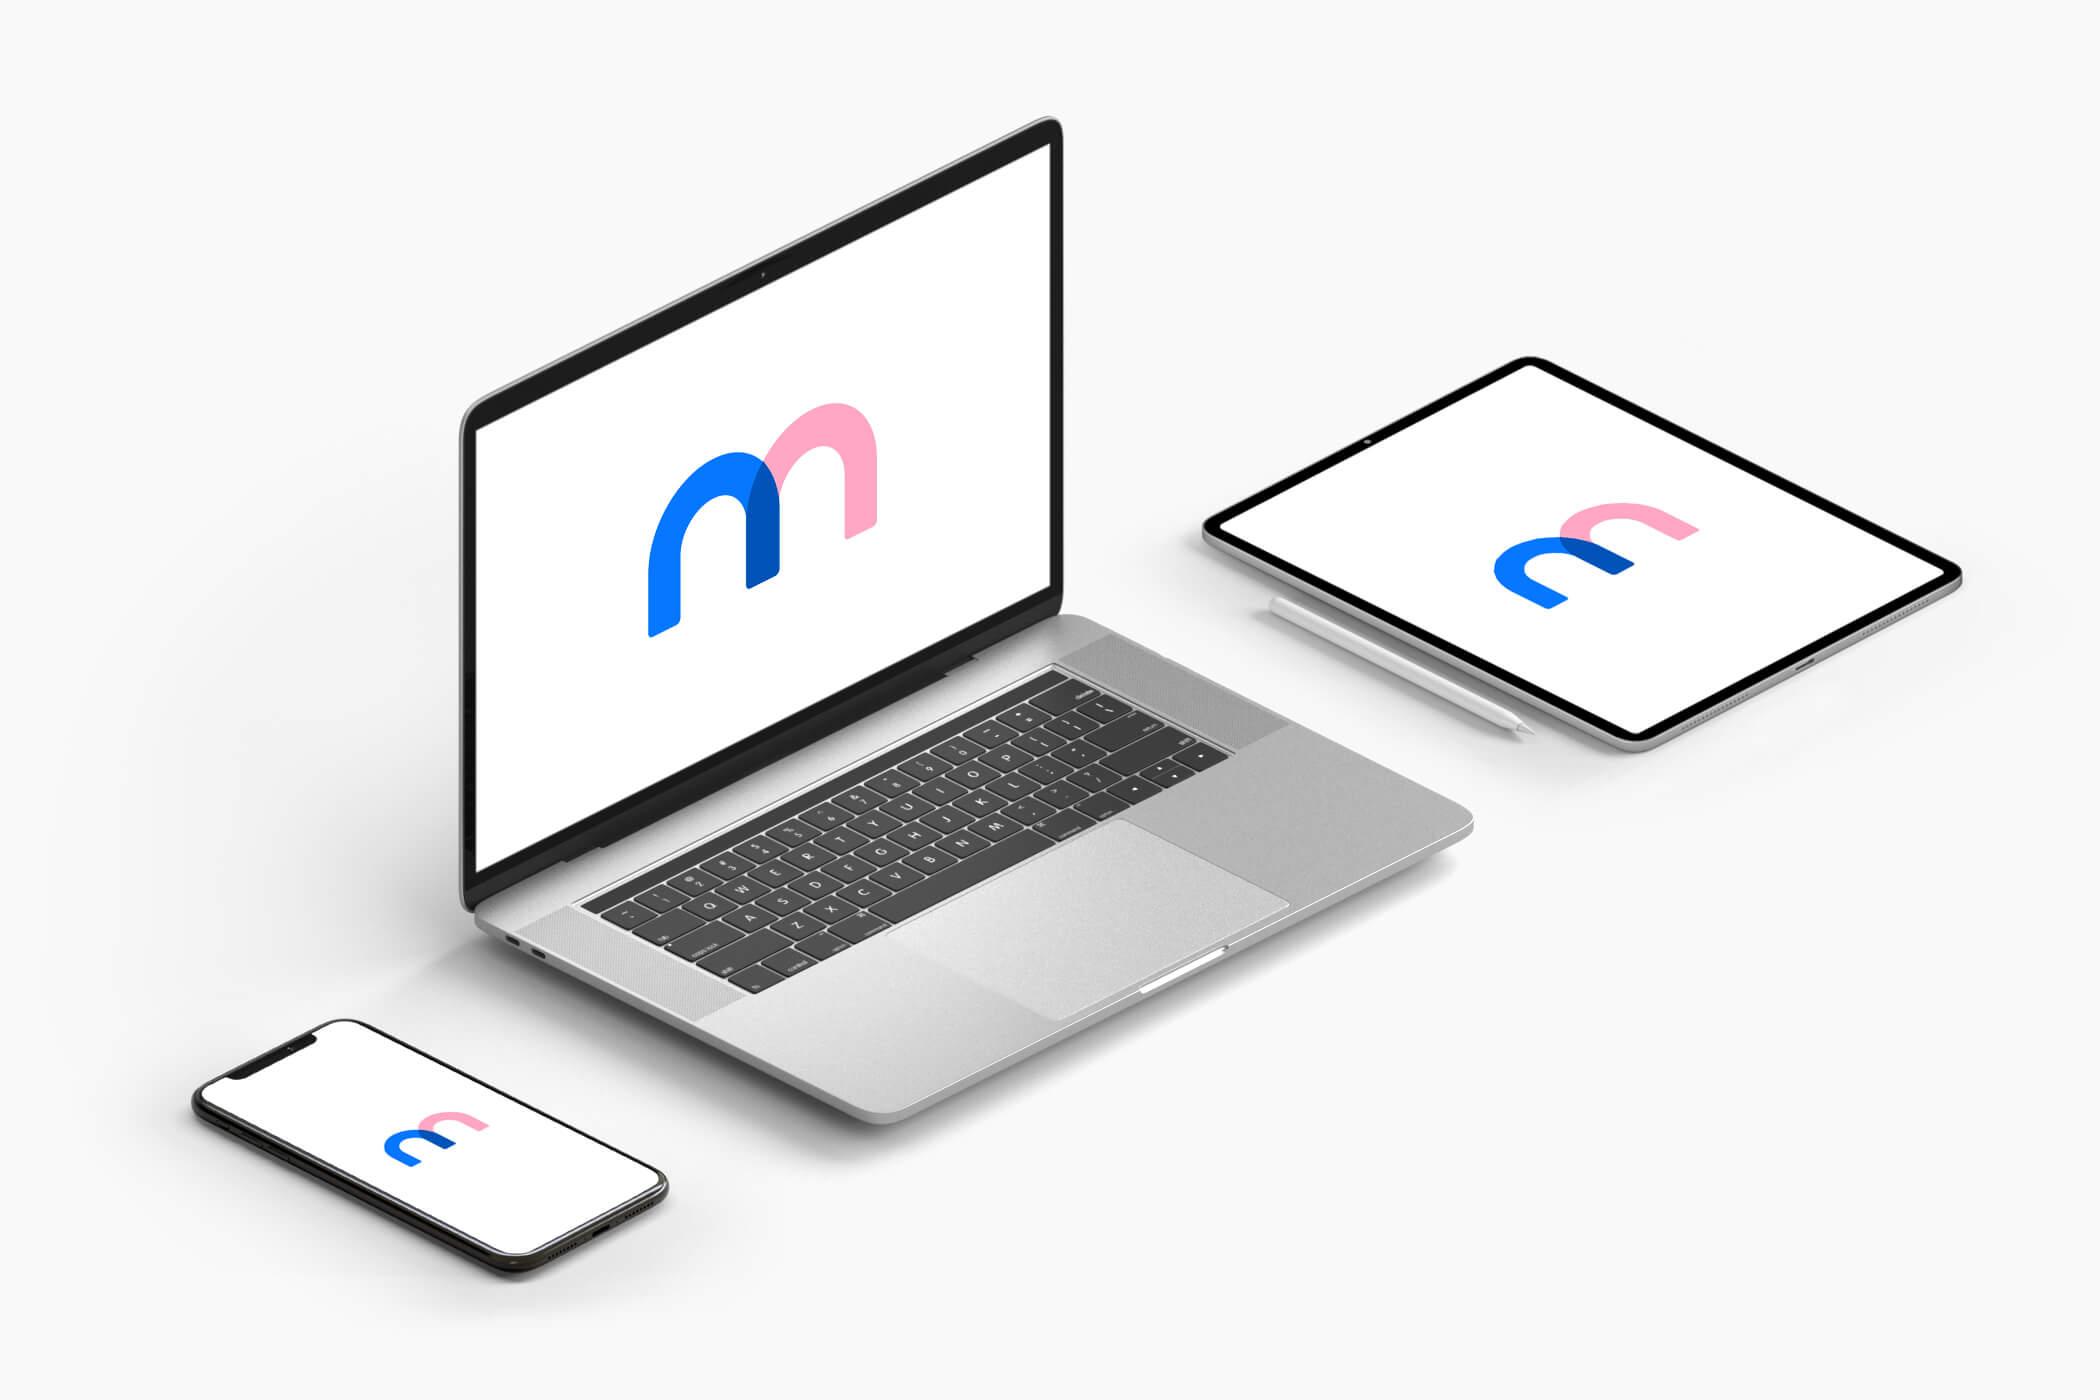 mediamodifier mockup generator responsive web app templates